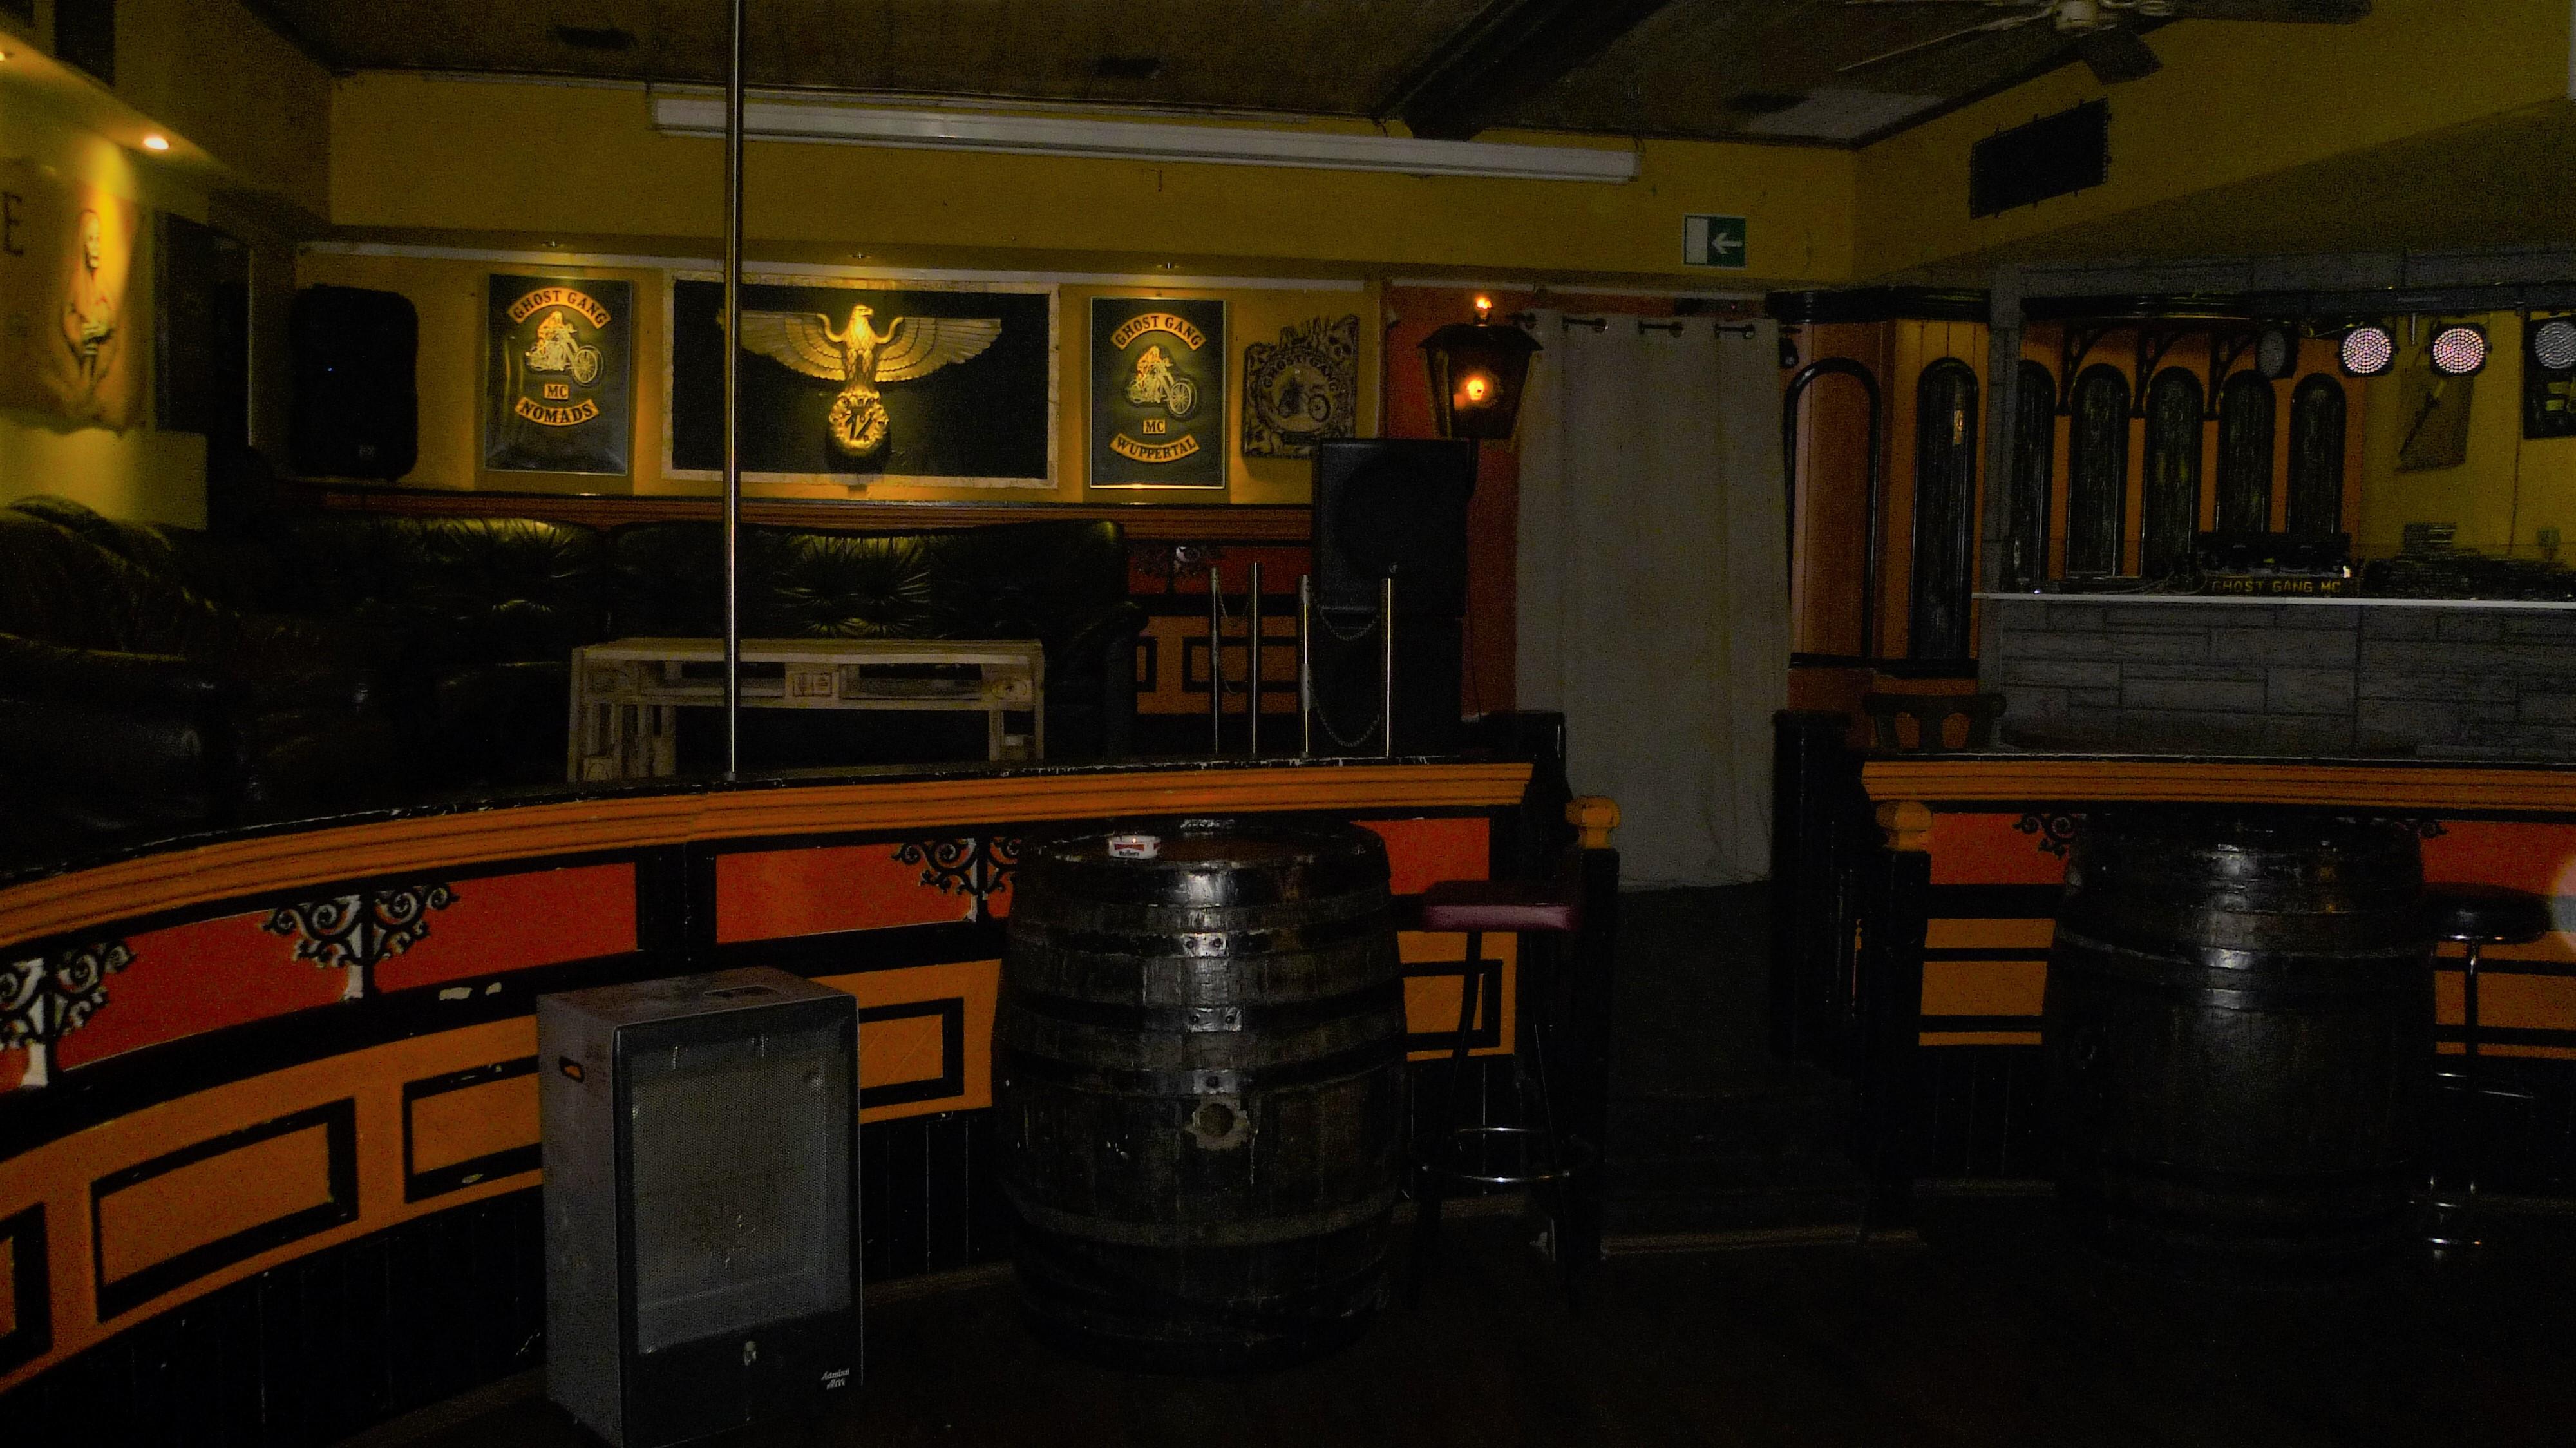 Gang mc ghost Bar owner